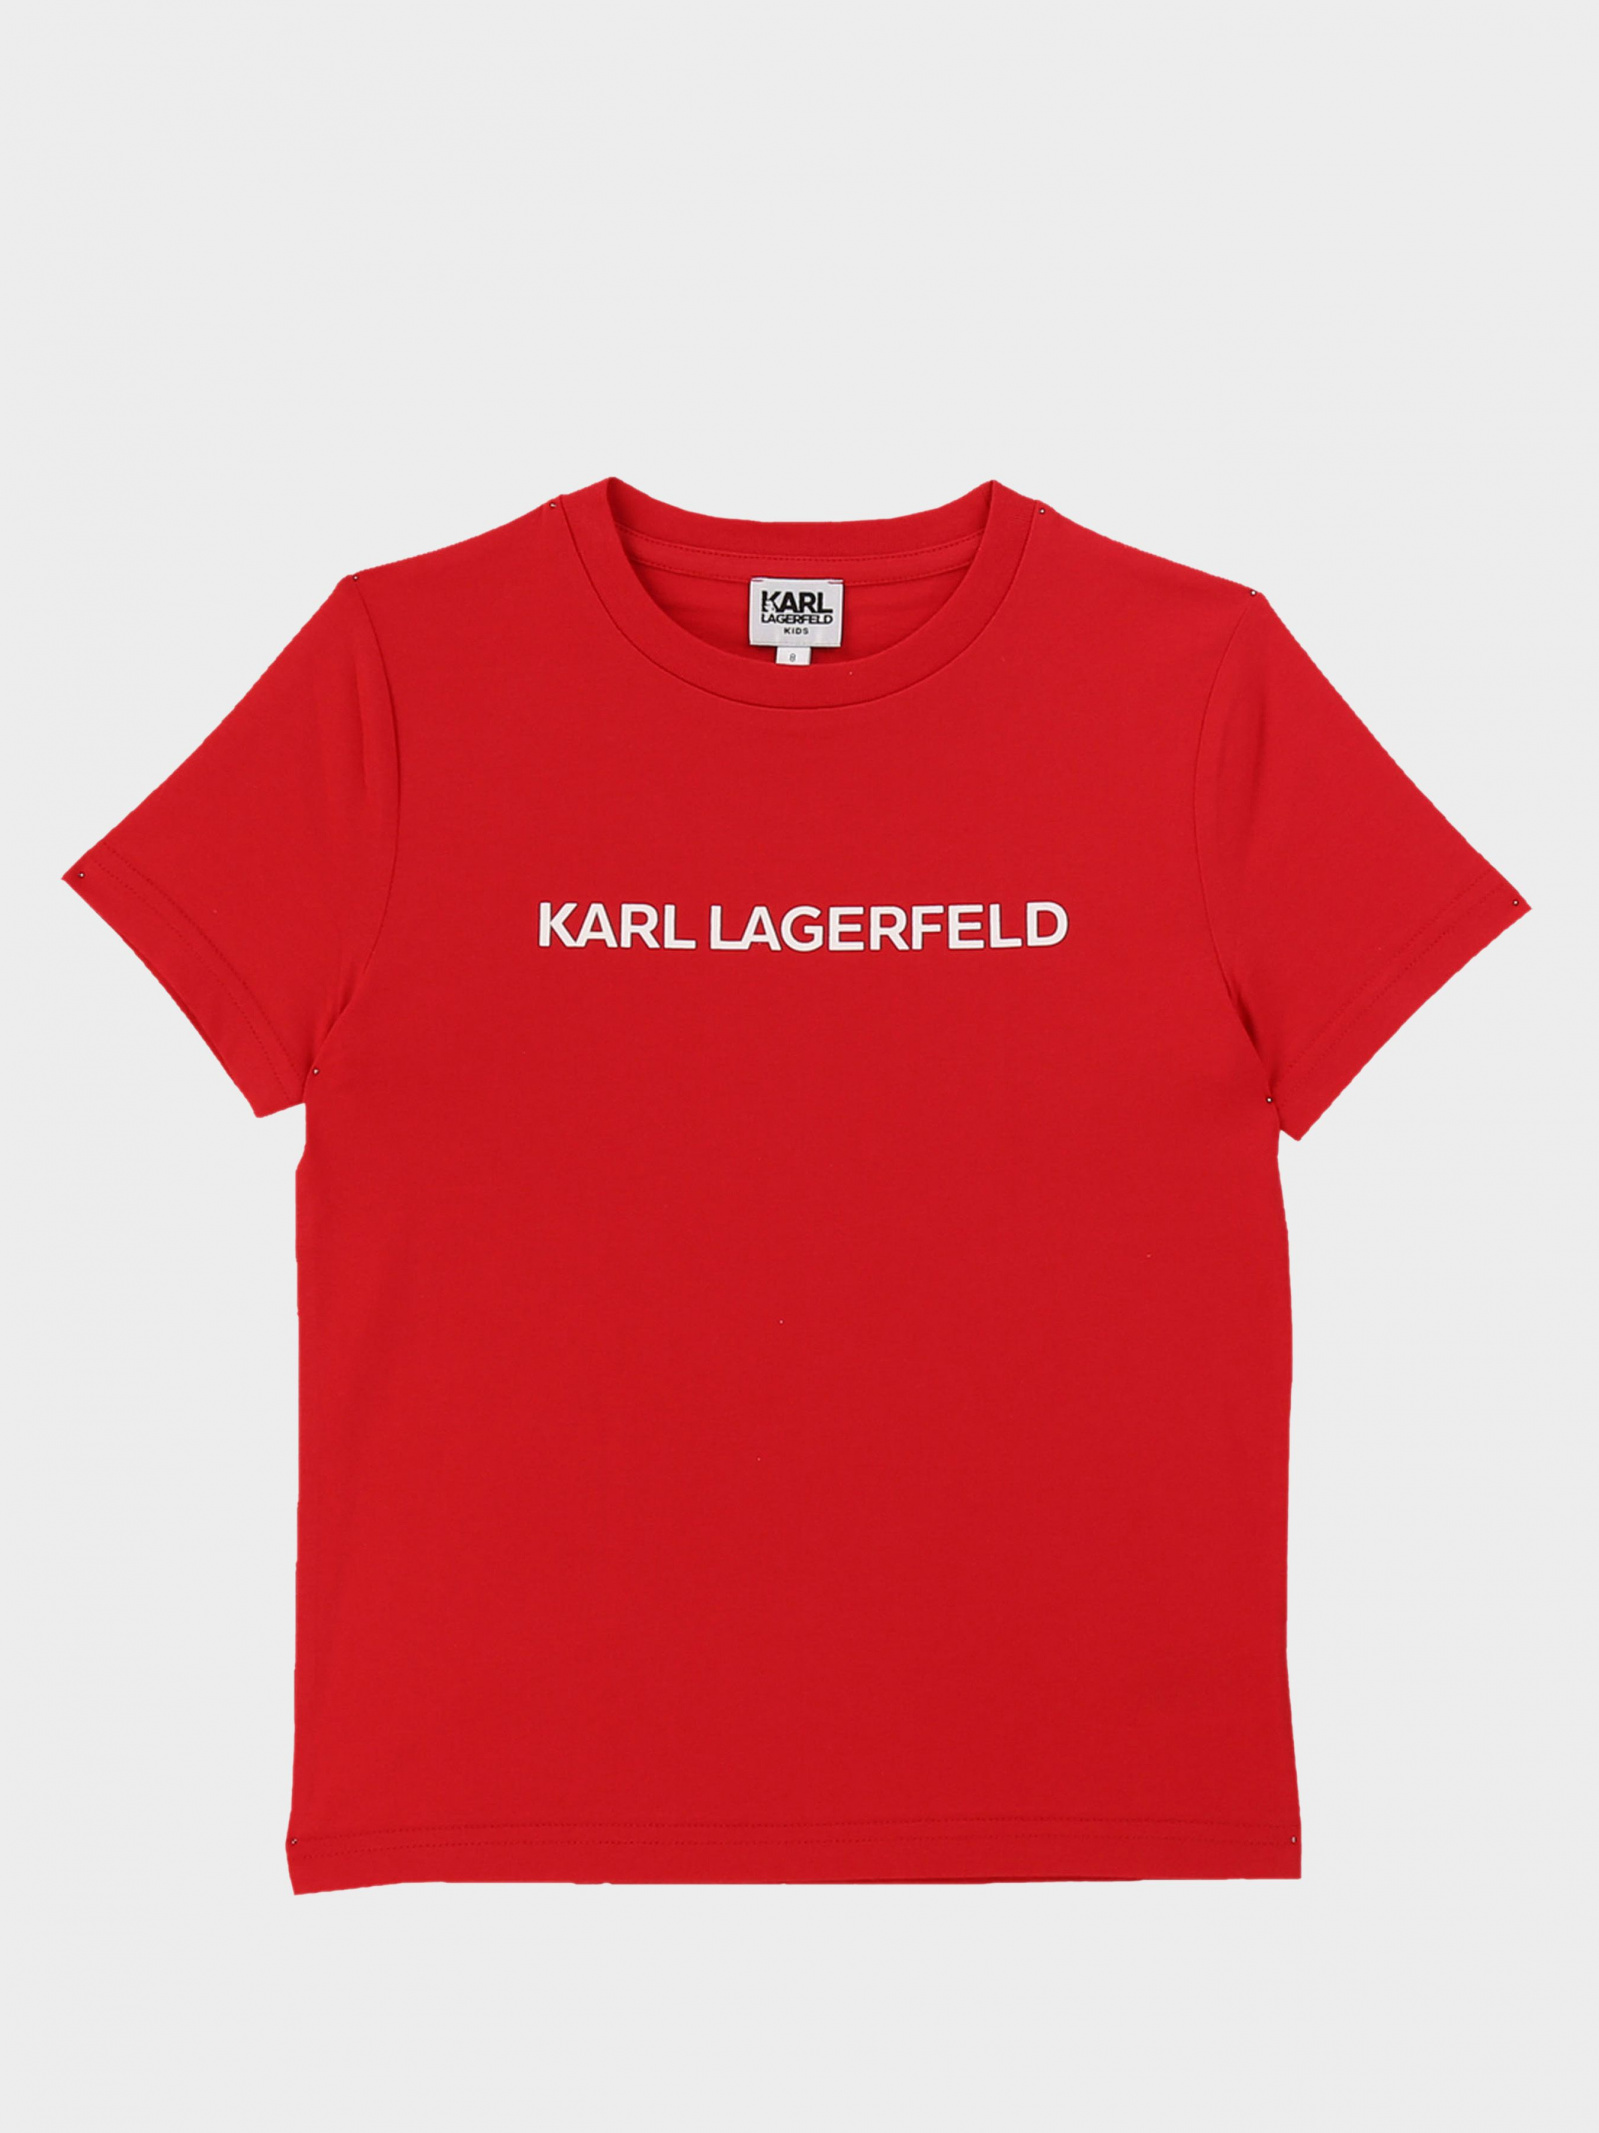 Футболка детские KARL LAGERFELD модель HR272 отзывы, 2017